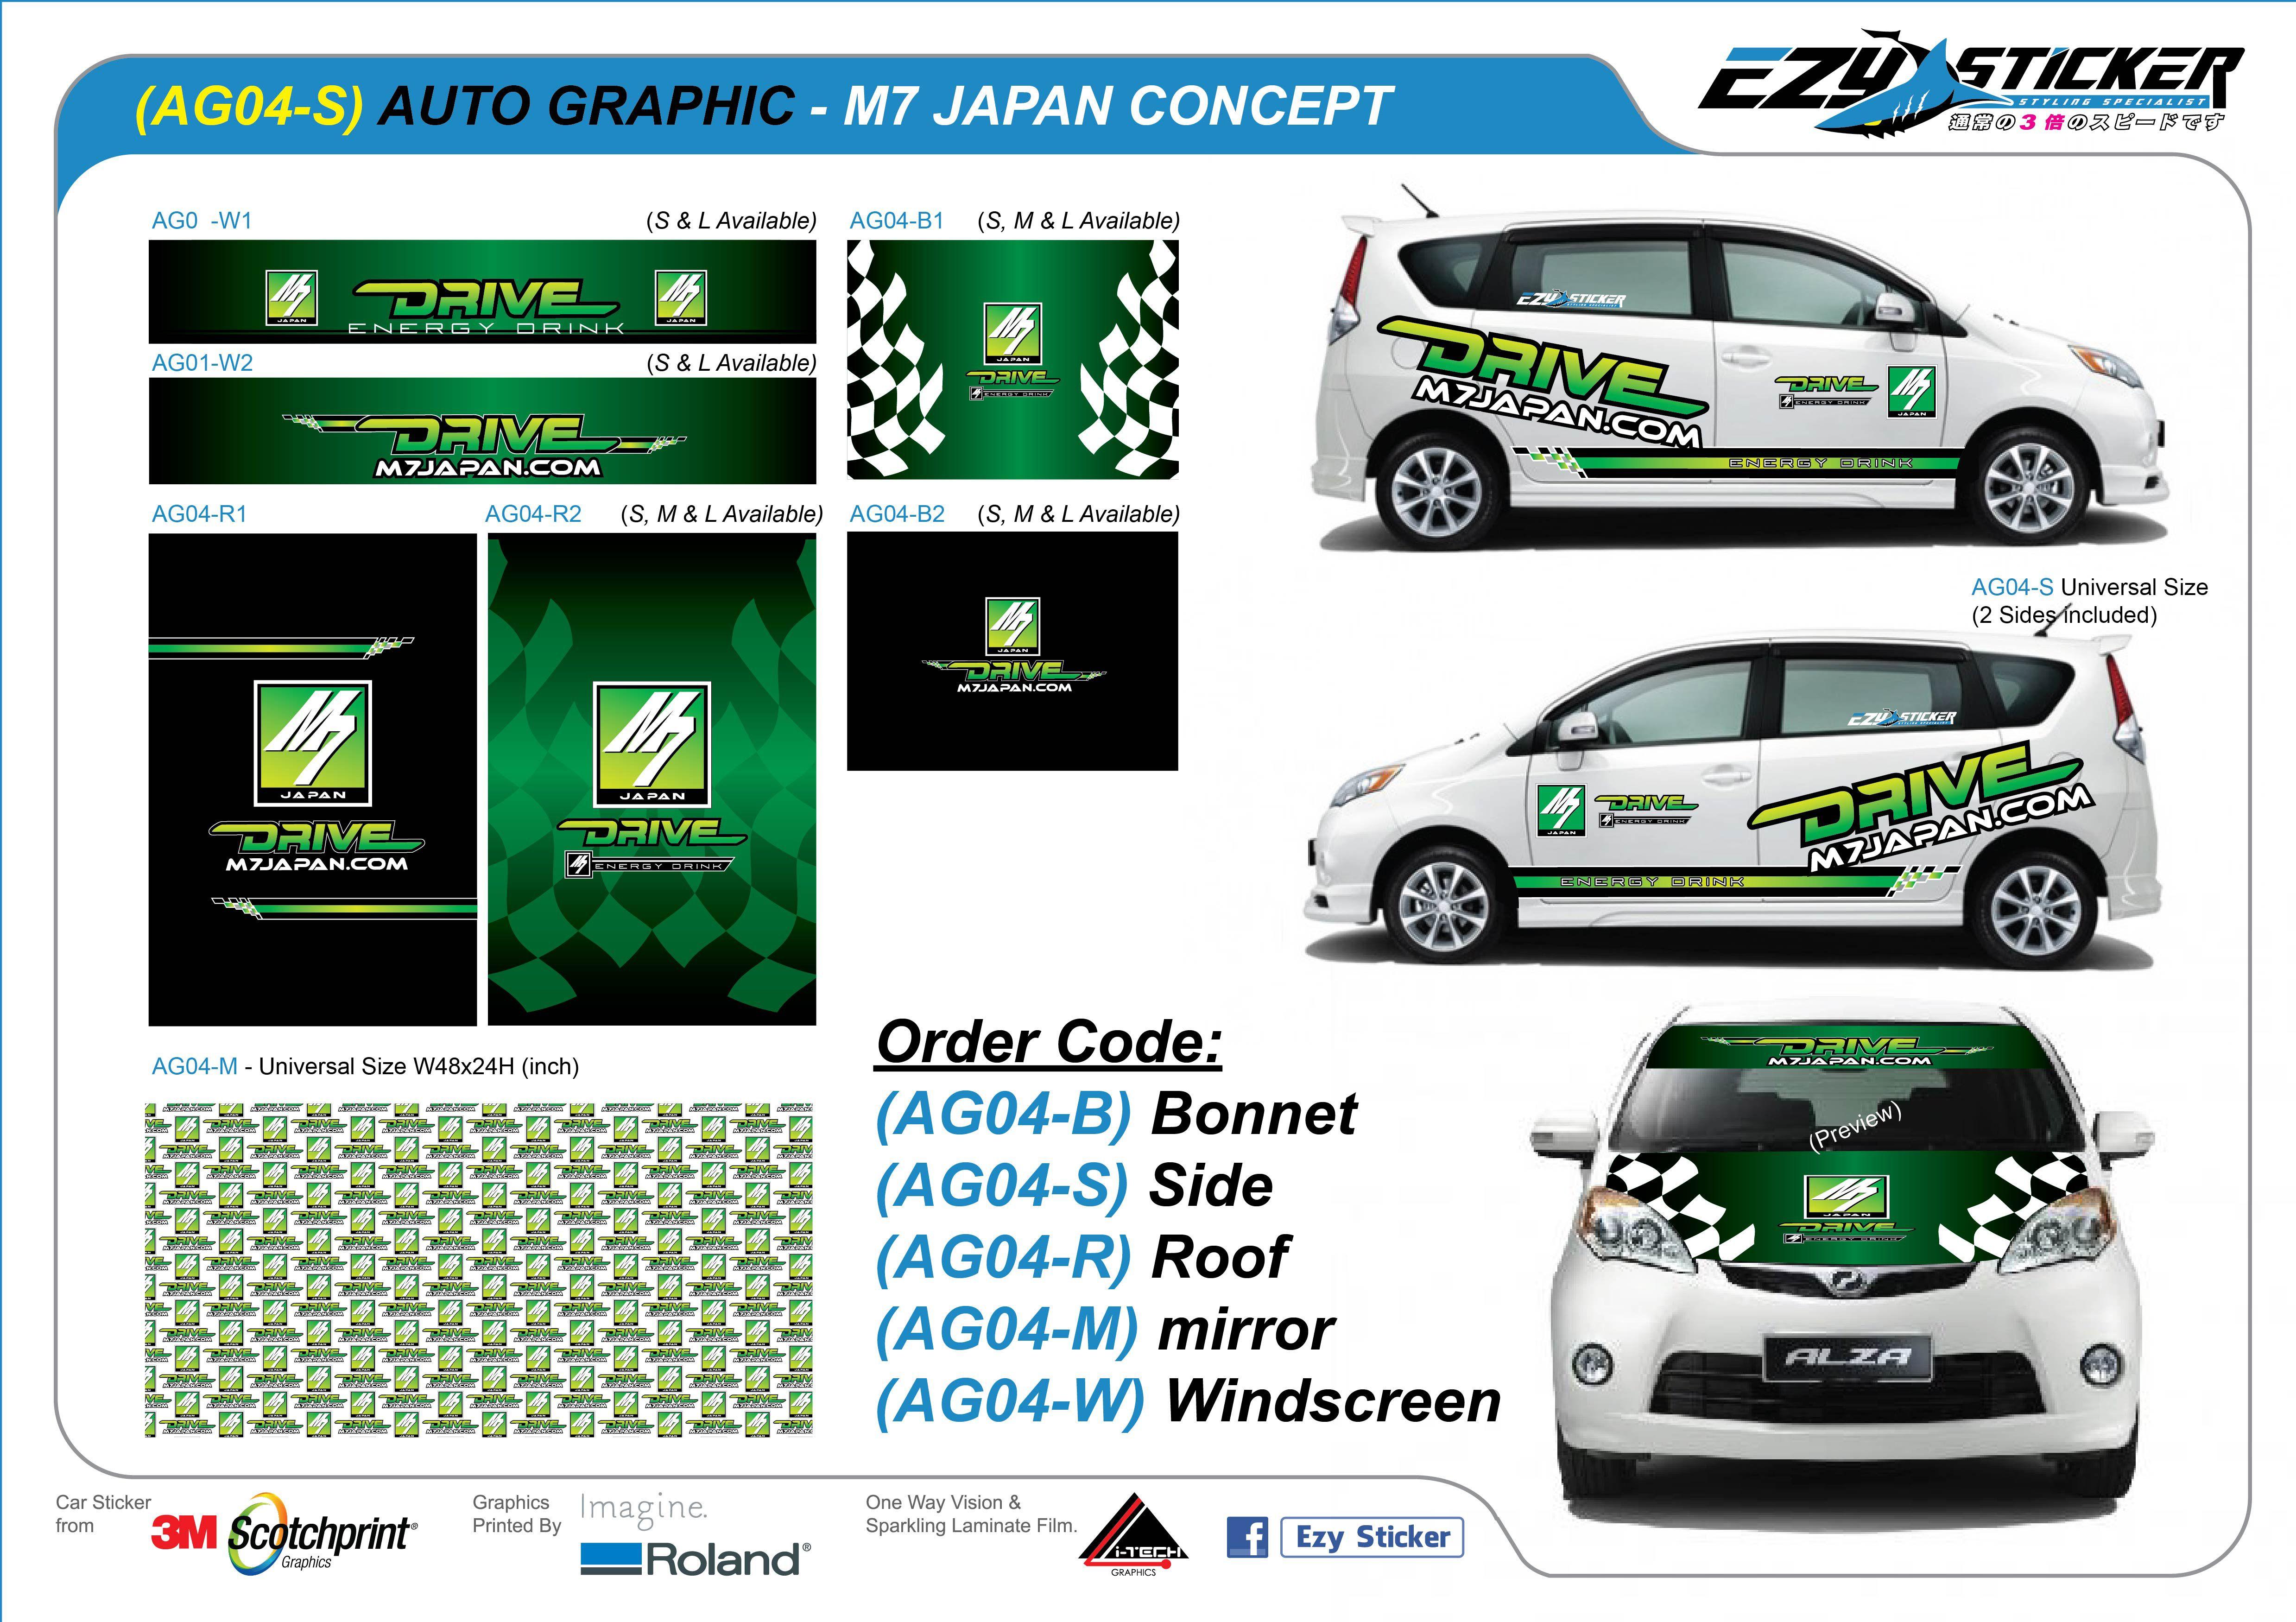 M7 Concept Auto Graphic Design Pls Visit Our FB ebook